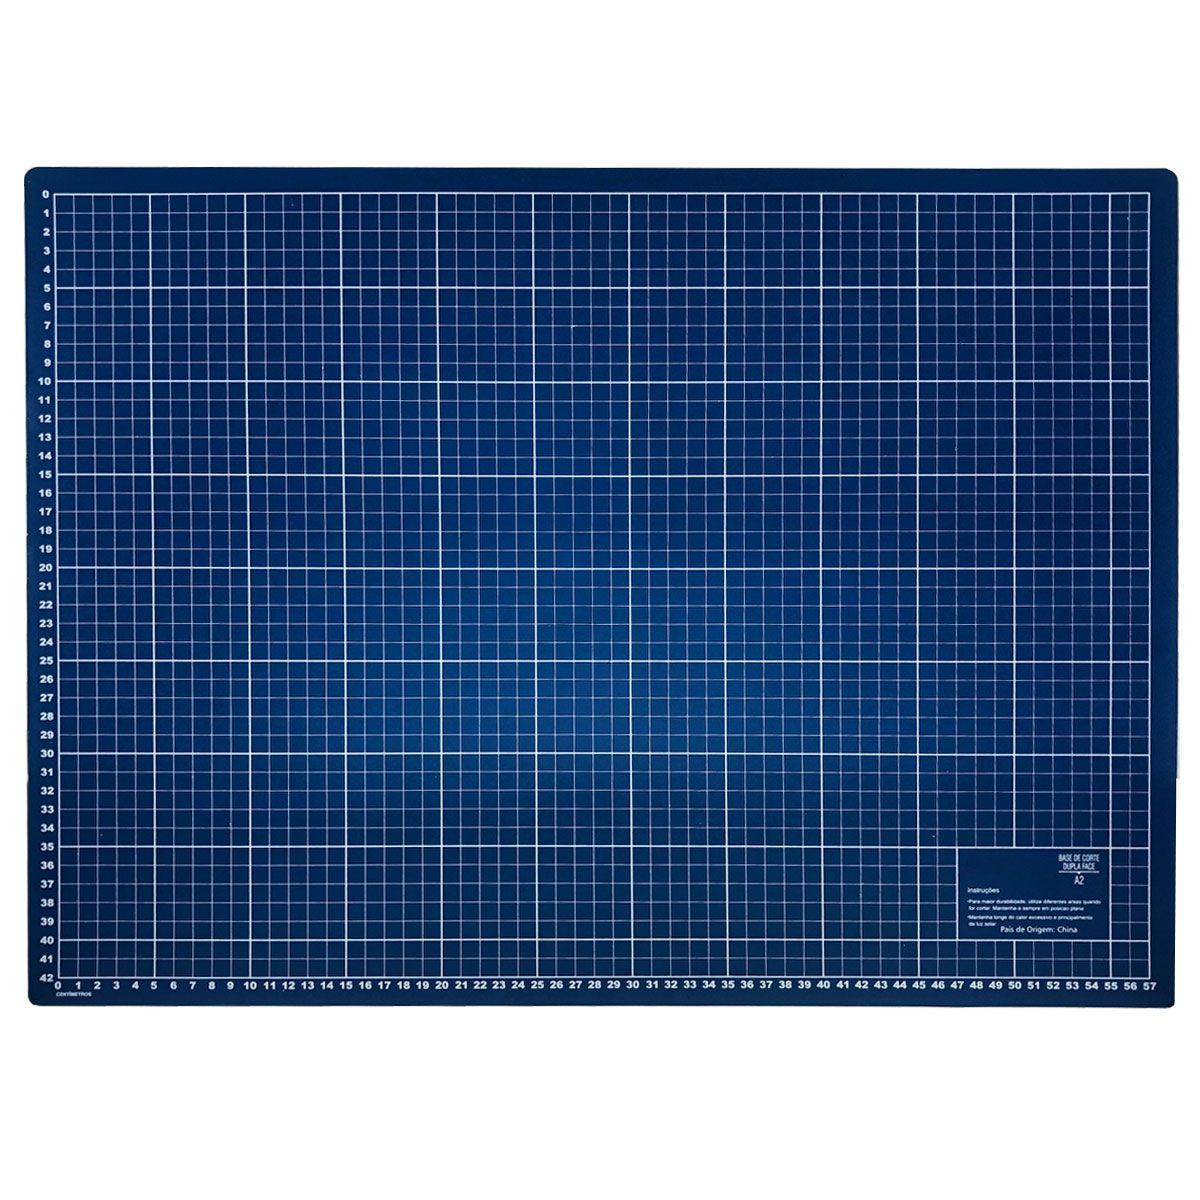 Base De Corte A2 Azul 60x45 cm Para Patchwork Scrapbook Artesanato